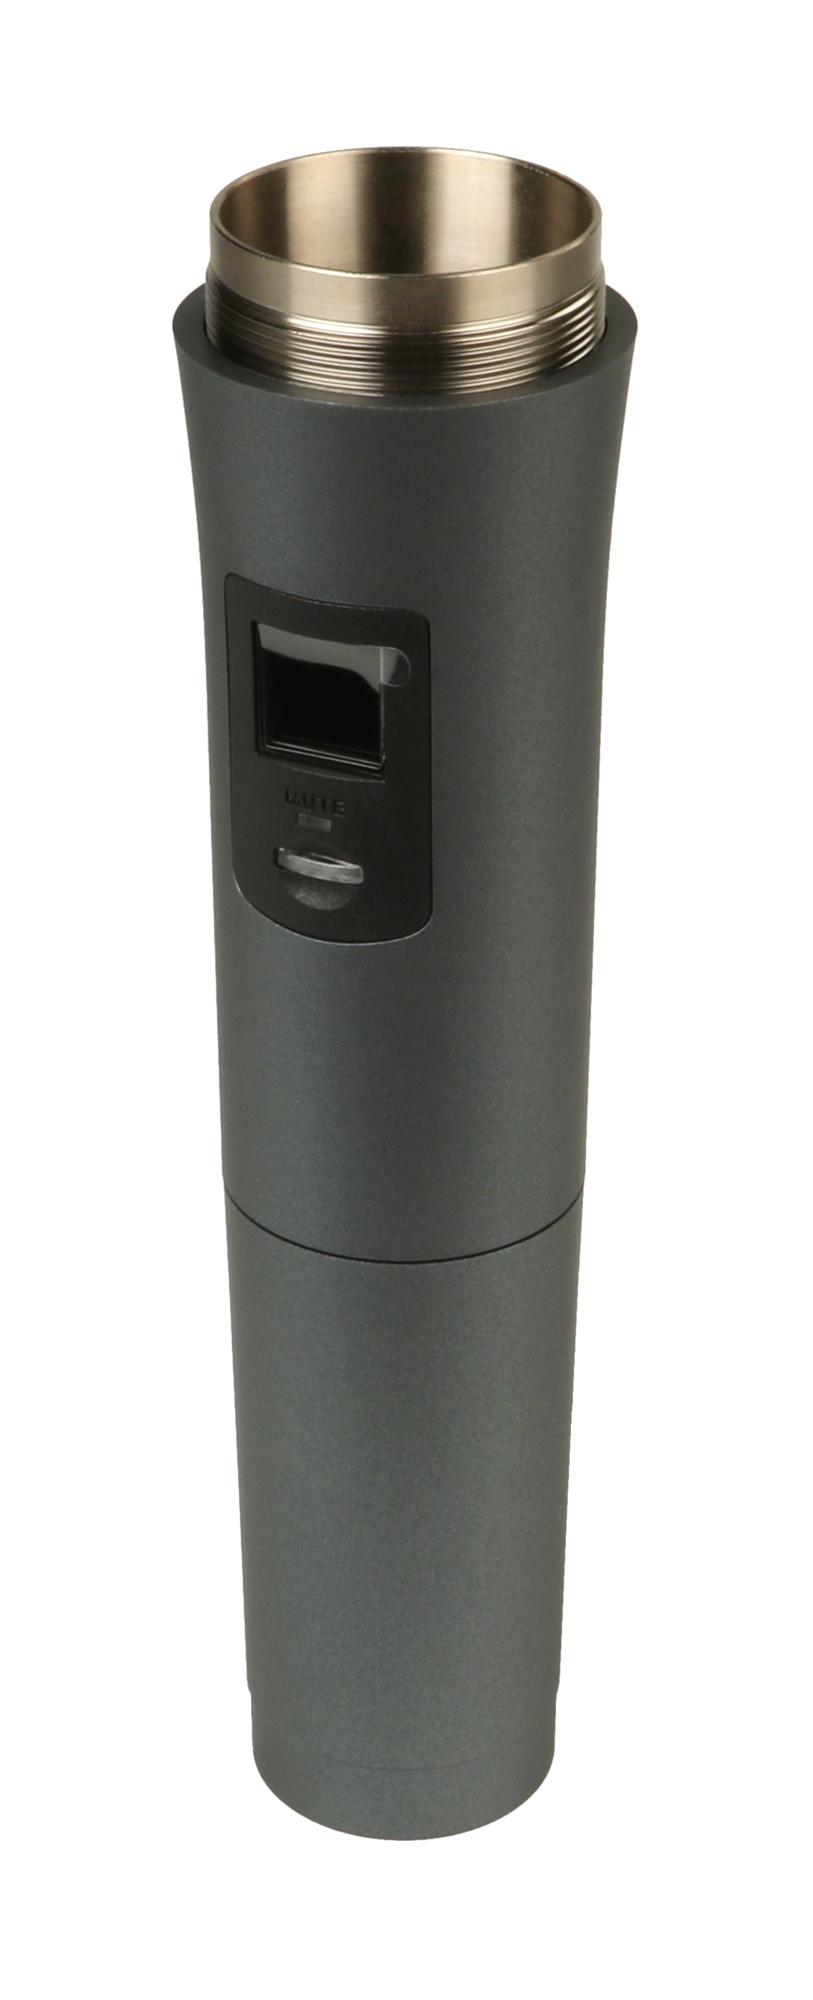 Sennheiser 548645 Handle for XSW35 548645